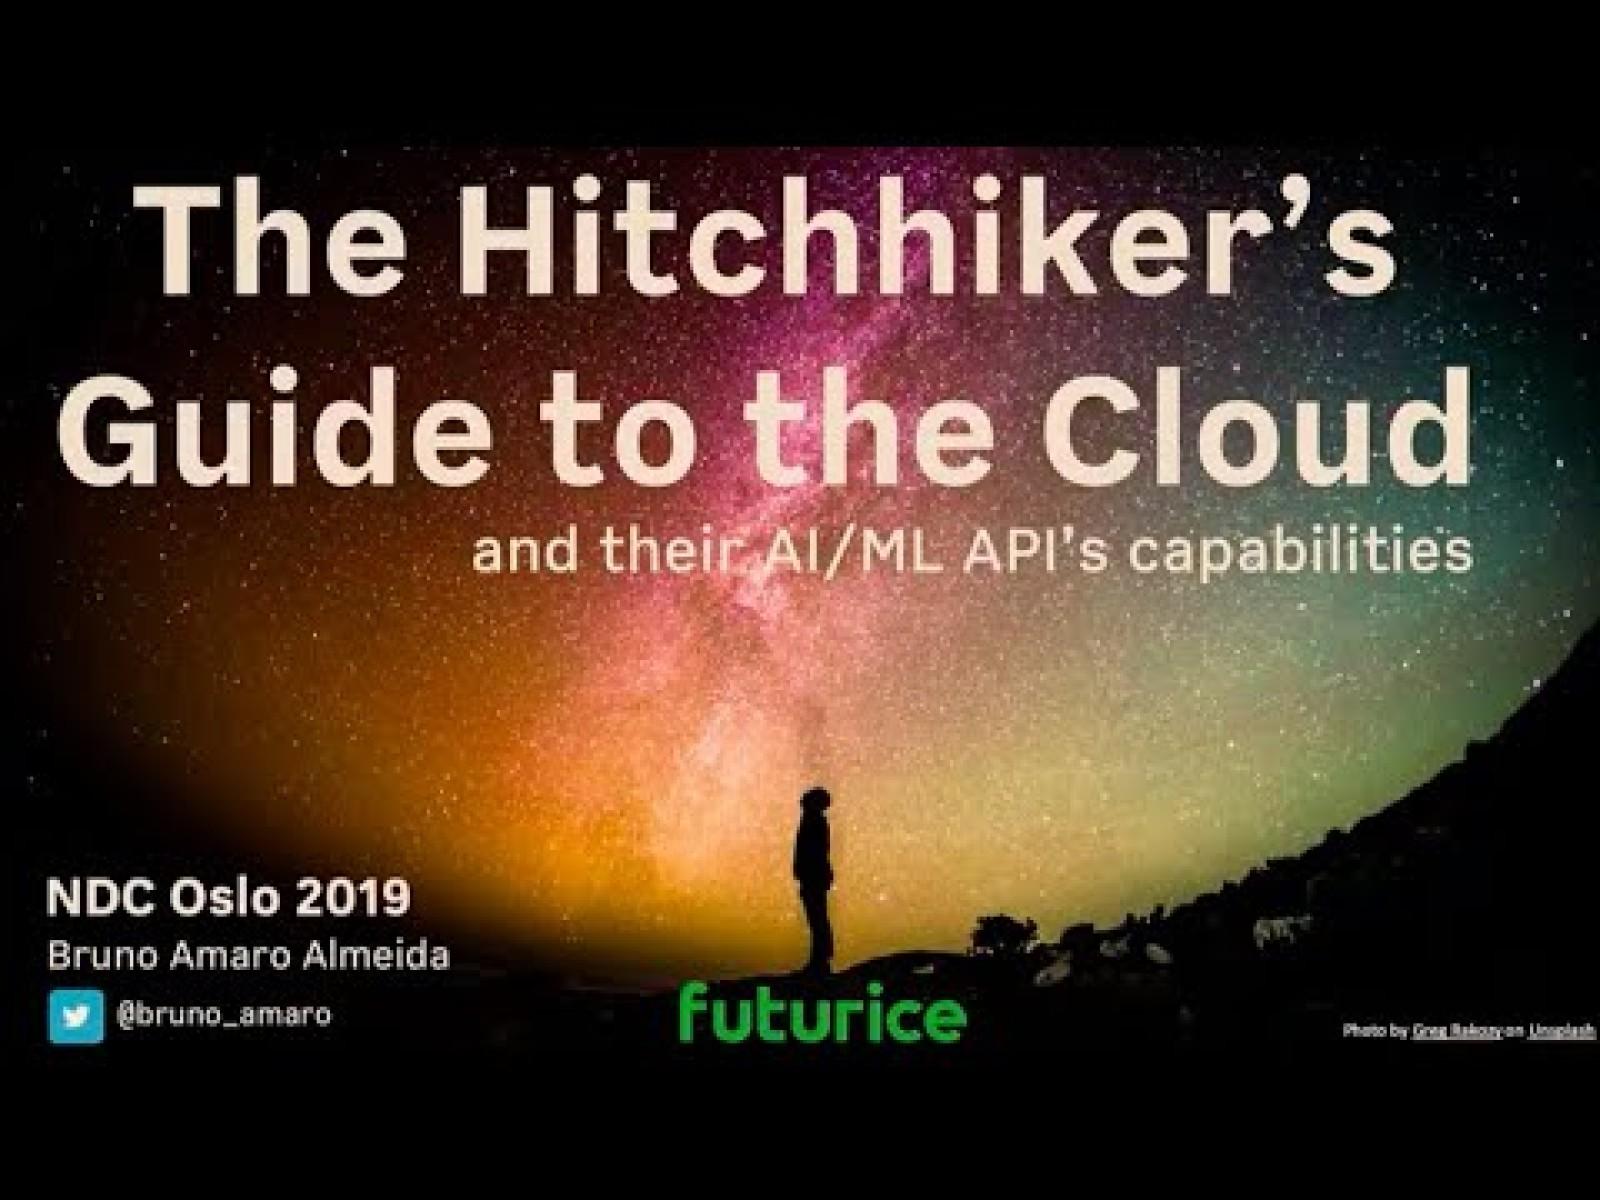 The Hitchhiker's Guide to the Cloud (AWS vs GCP vs Azure) and their AI/ML API's capabilities